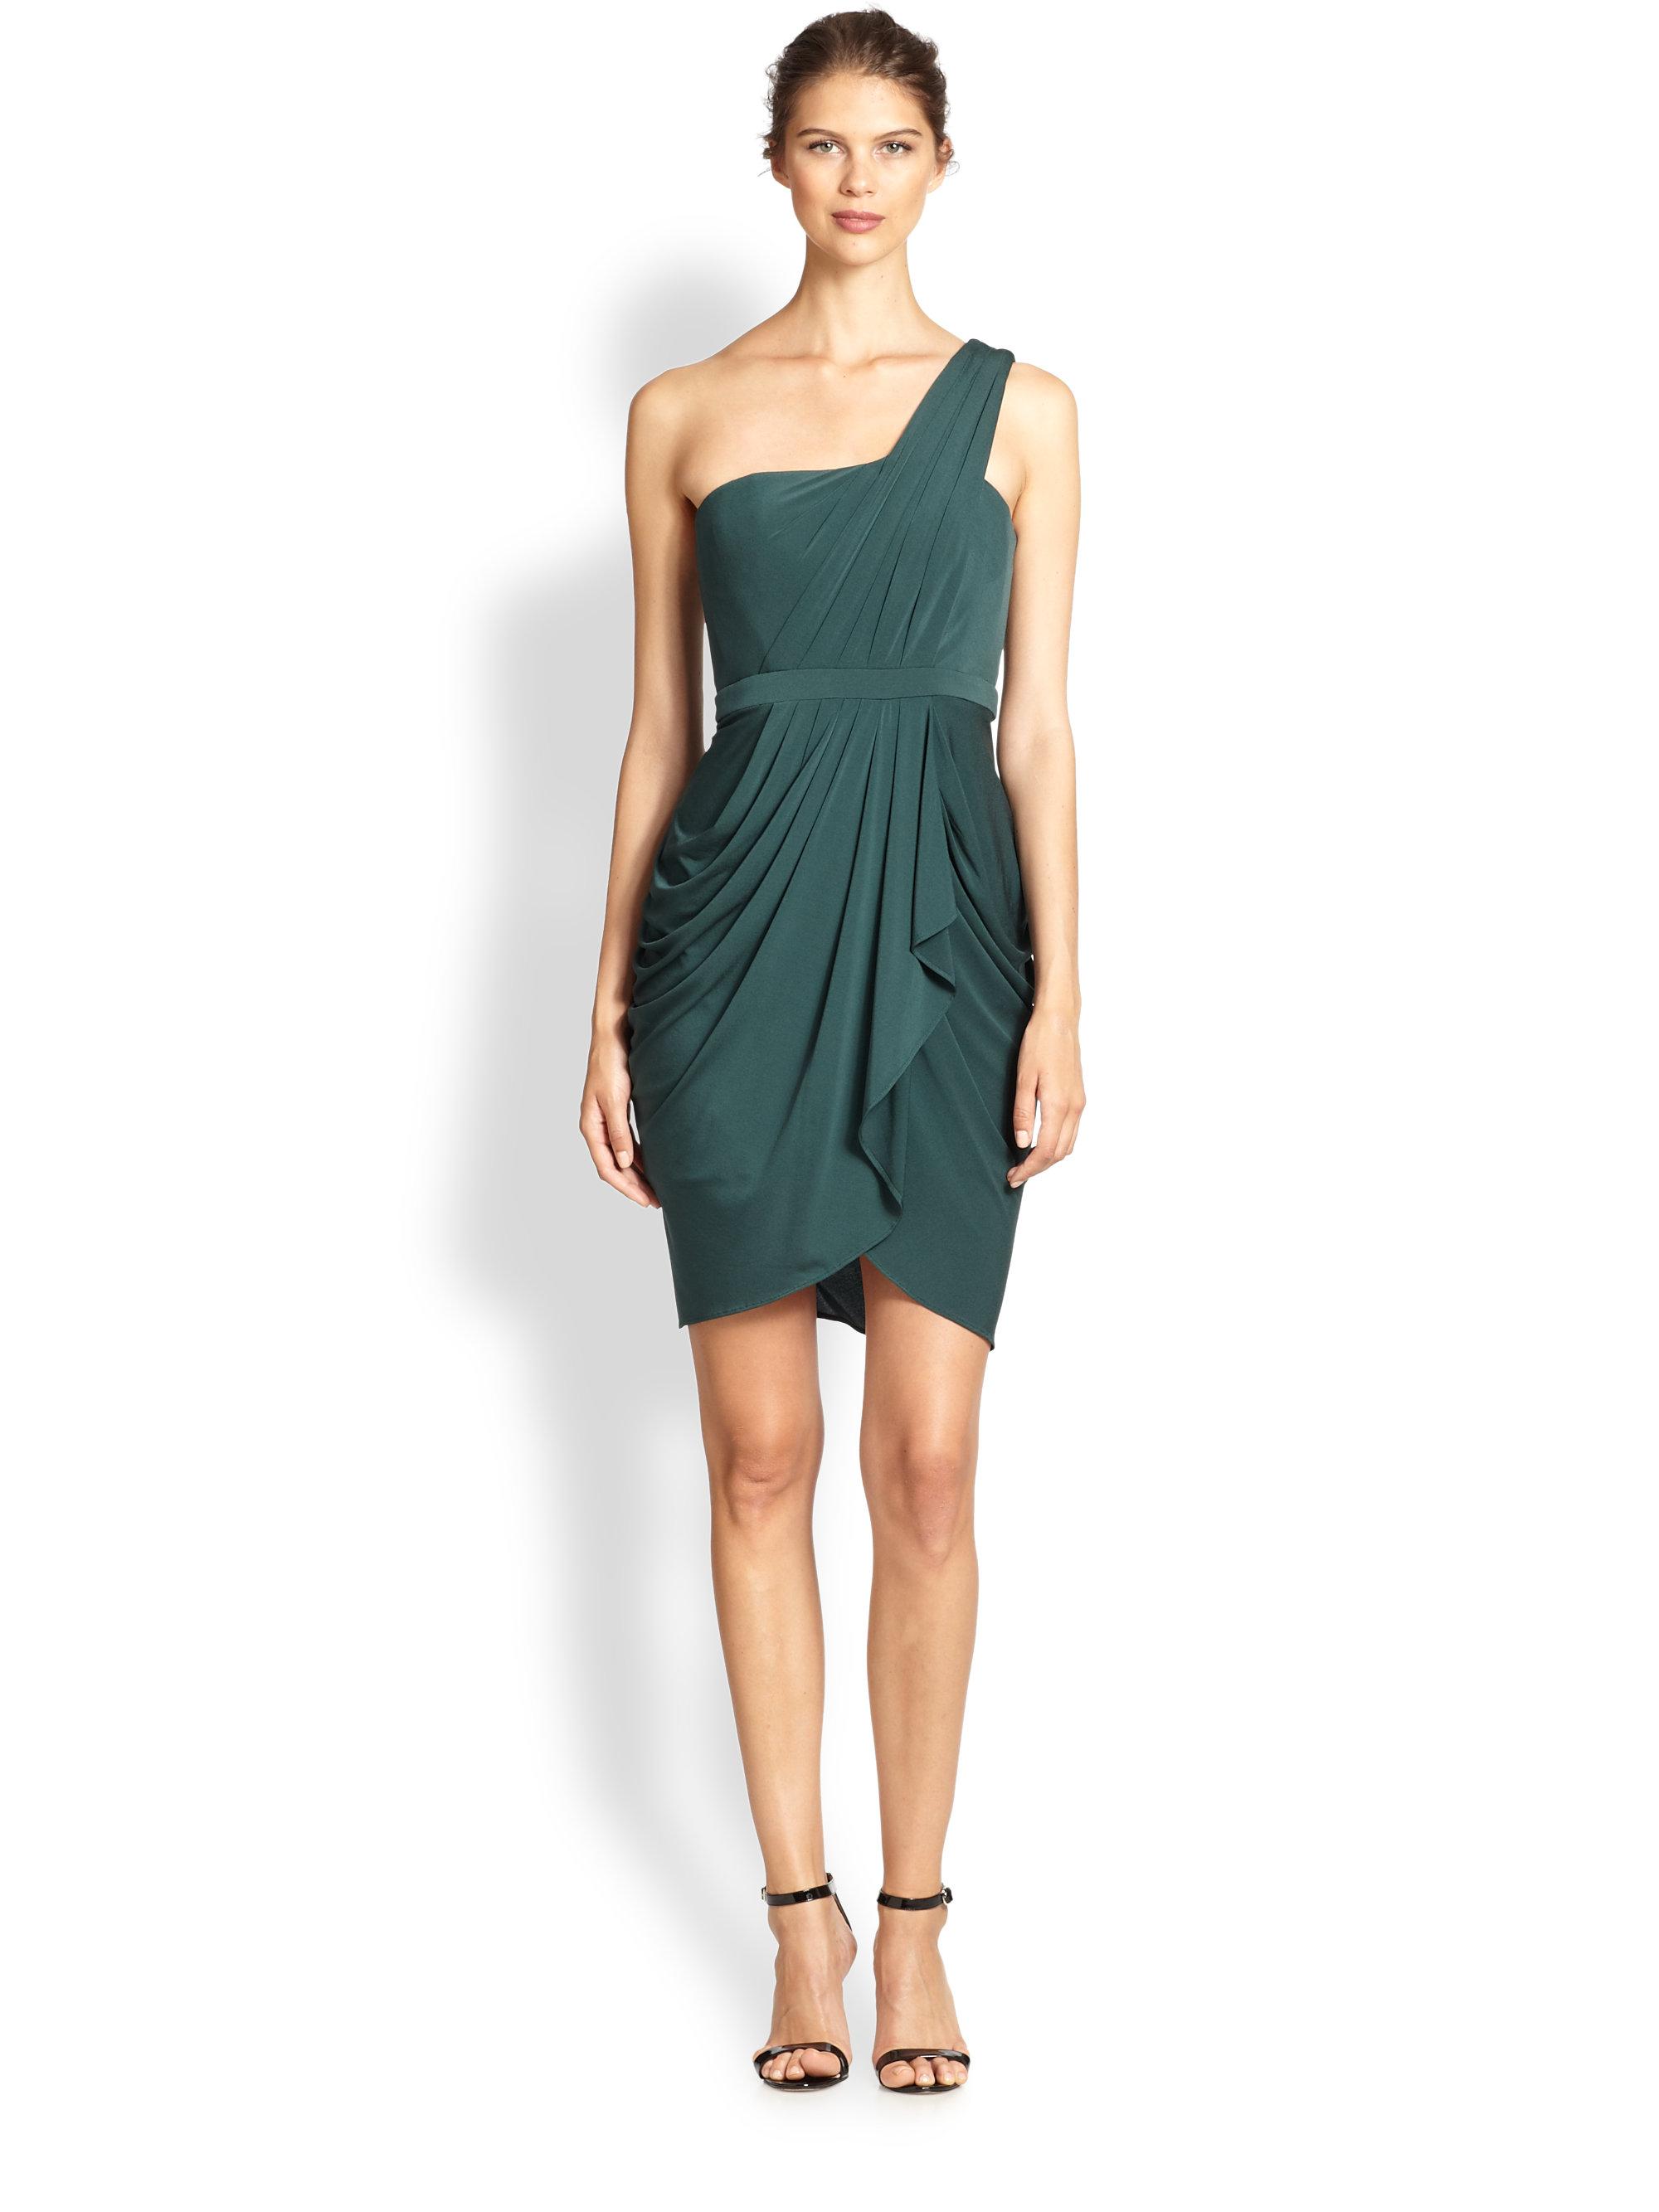 6acb6830aa0 BCBGMAXAZRIA Julietta One-Shoulder Ruched Dress in Green - Lyst